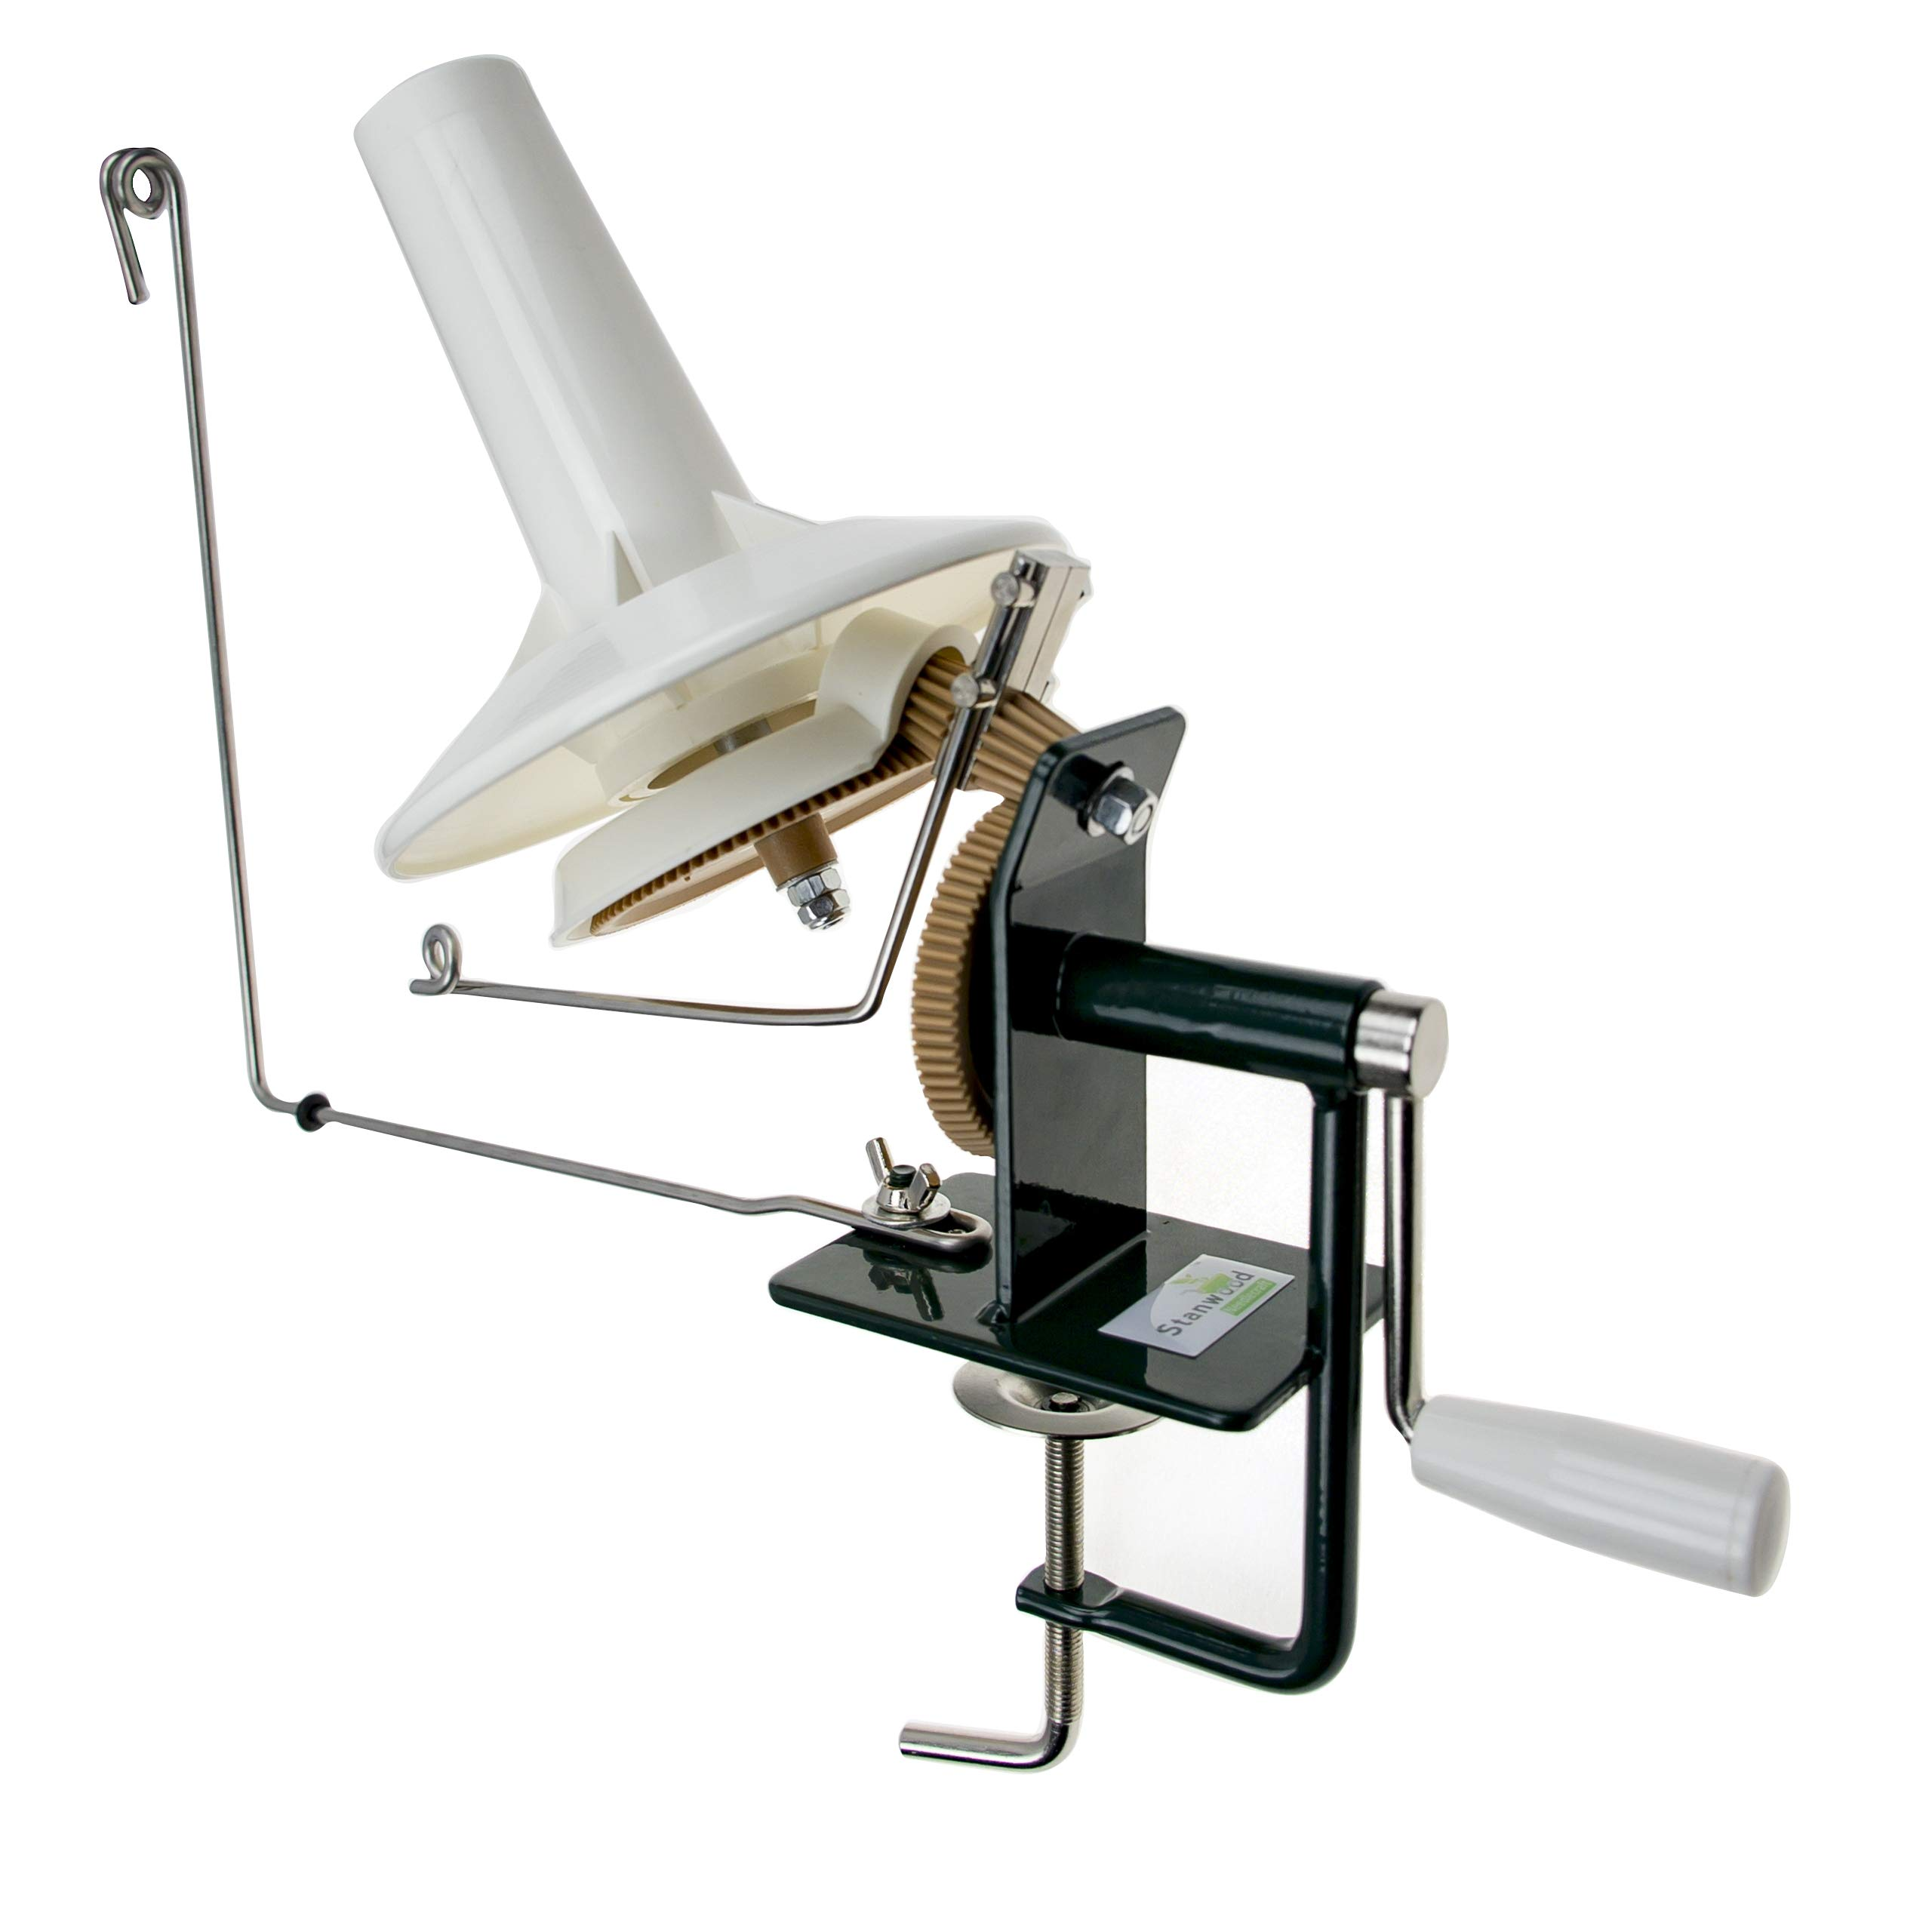 Stanwood Needlecraft Large Metal Yarn/Fiber/Wool/String Ball Winder, 10-Ounce by Stanwood Needlecraft (Image #2)